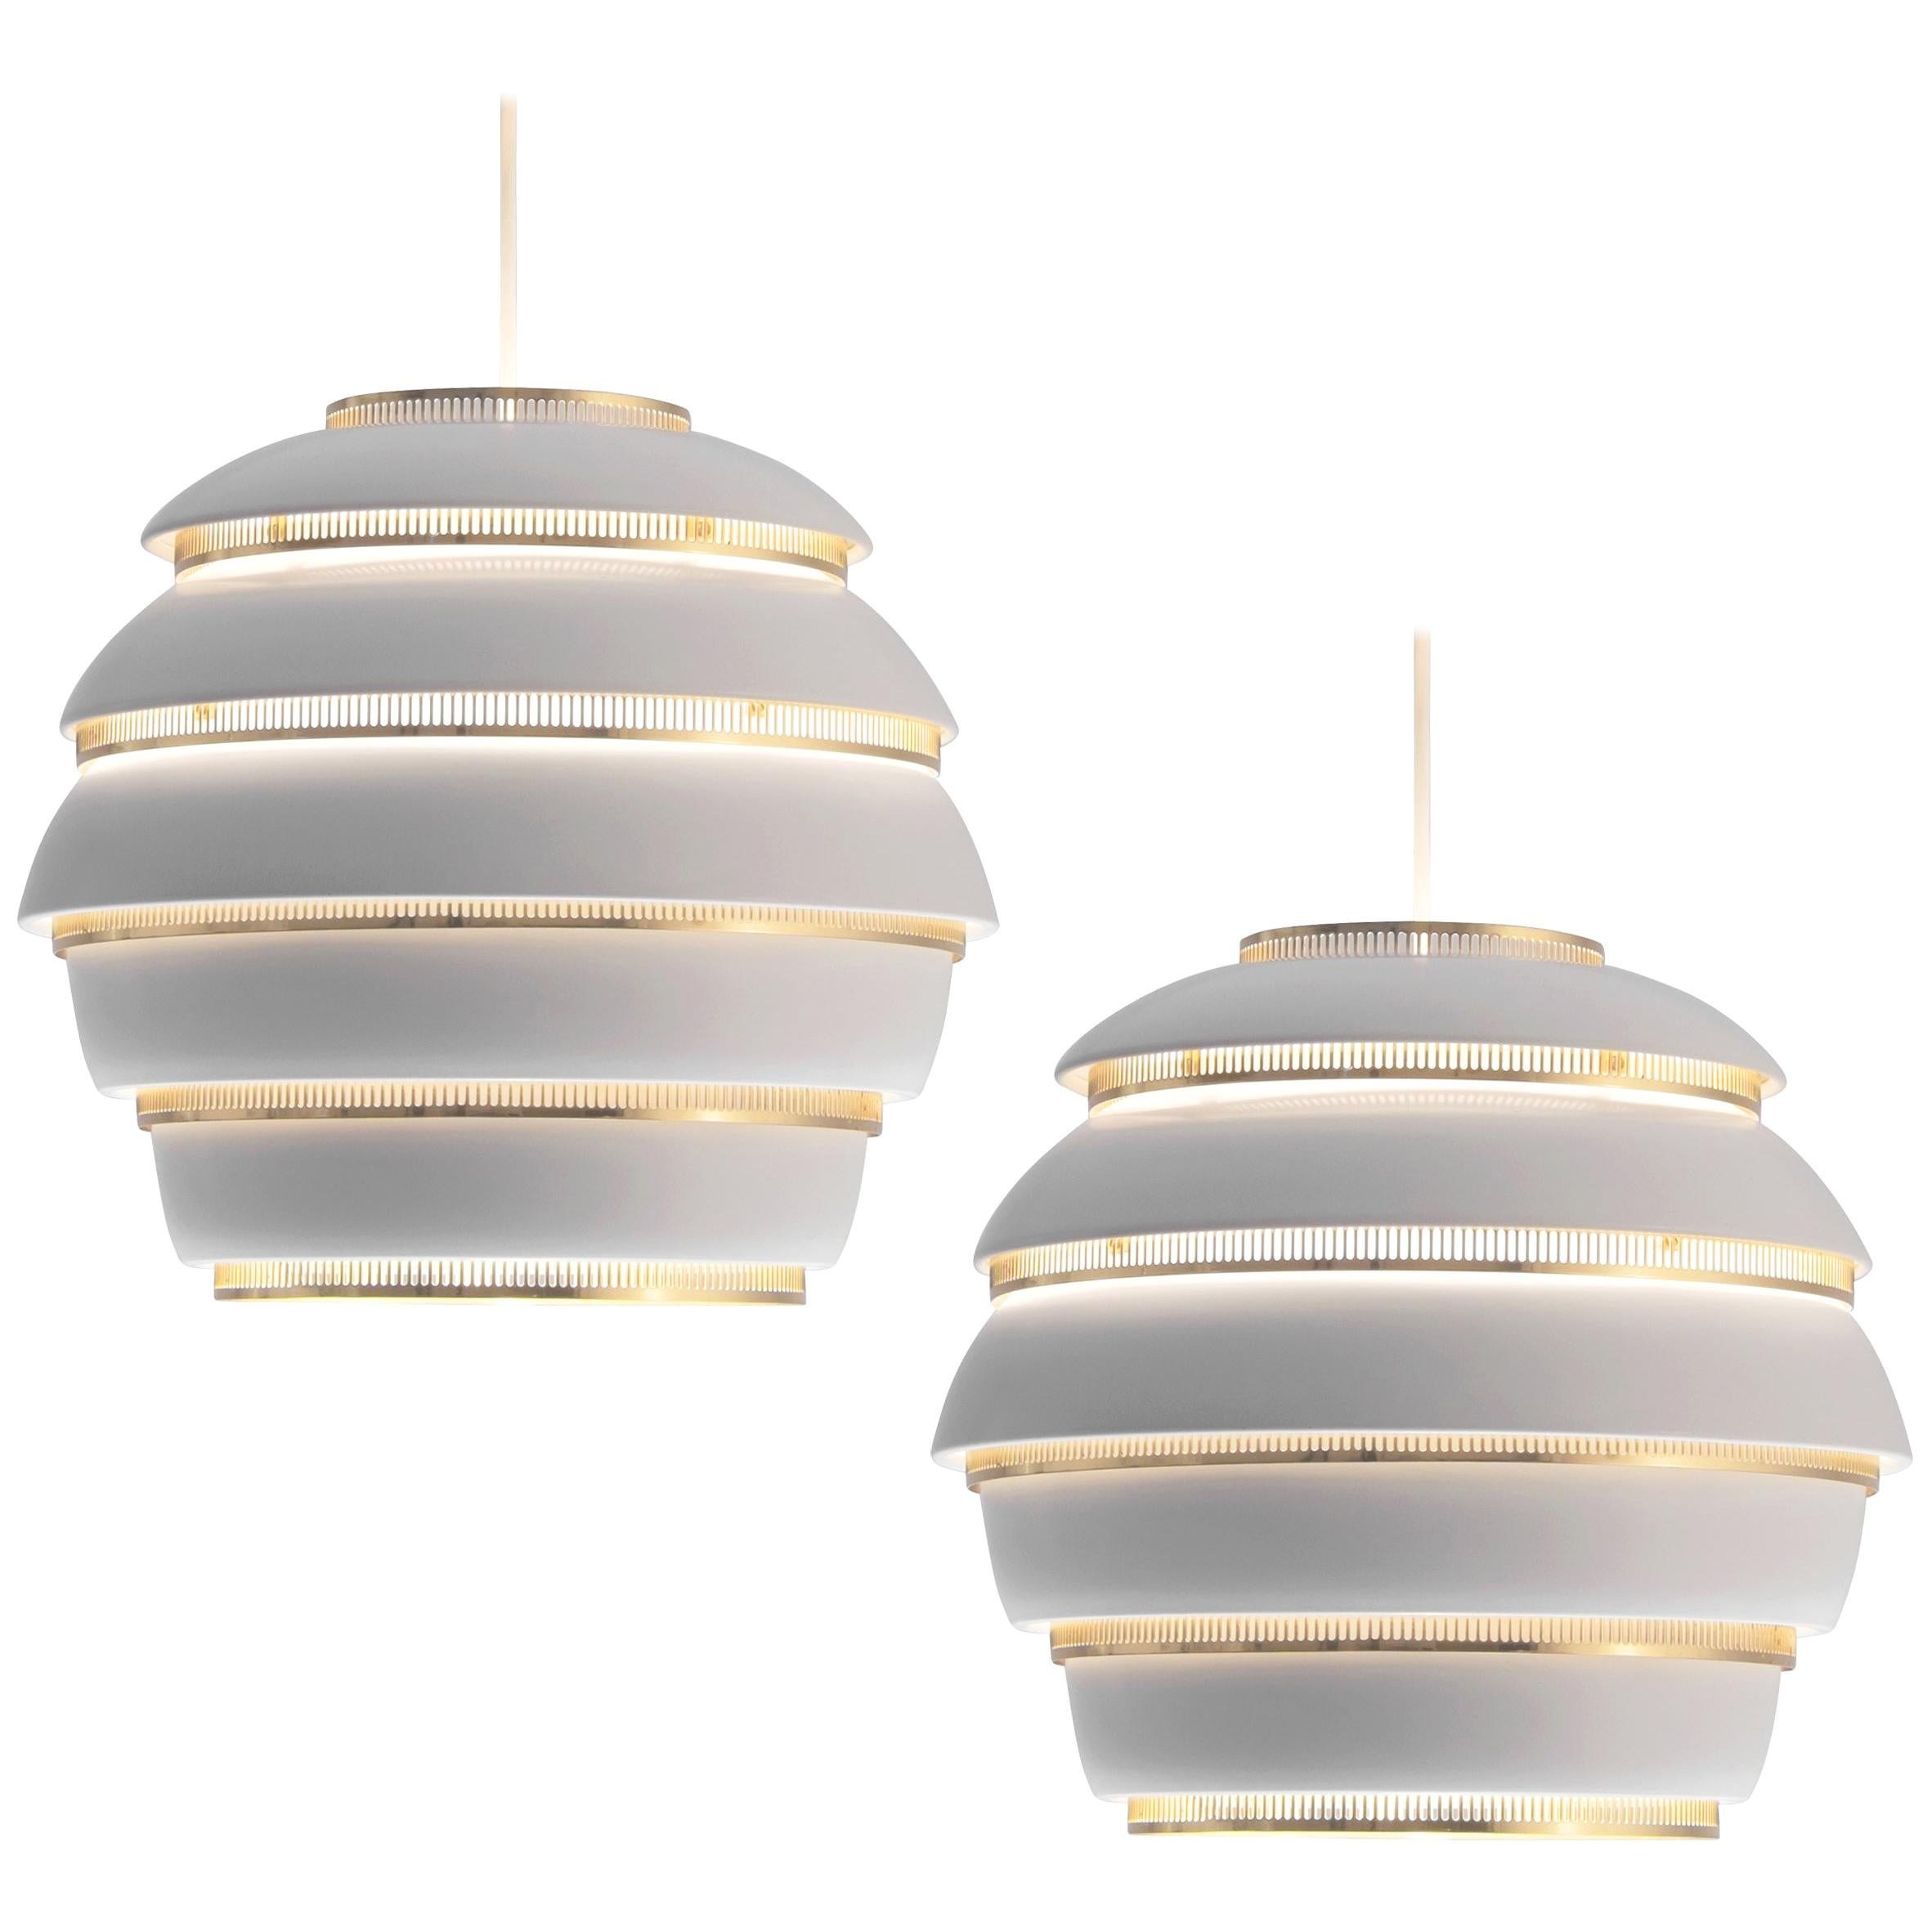 Alvar Aalto for Valaisinpaja Oy 'Beehive' Pendant Lamps in White Metal